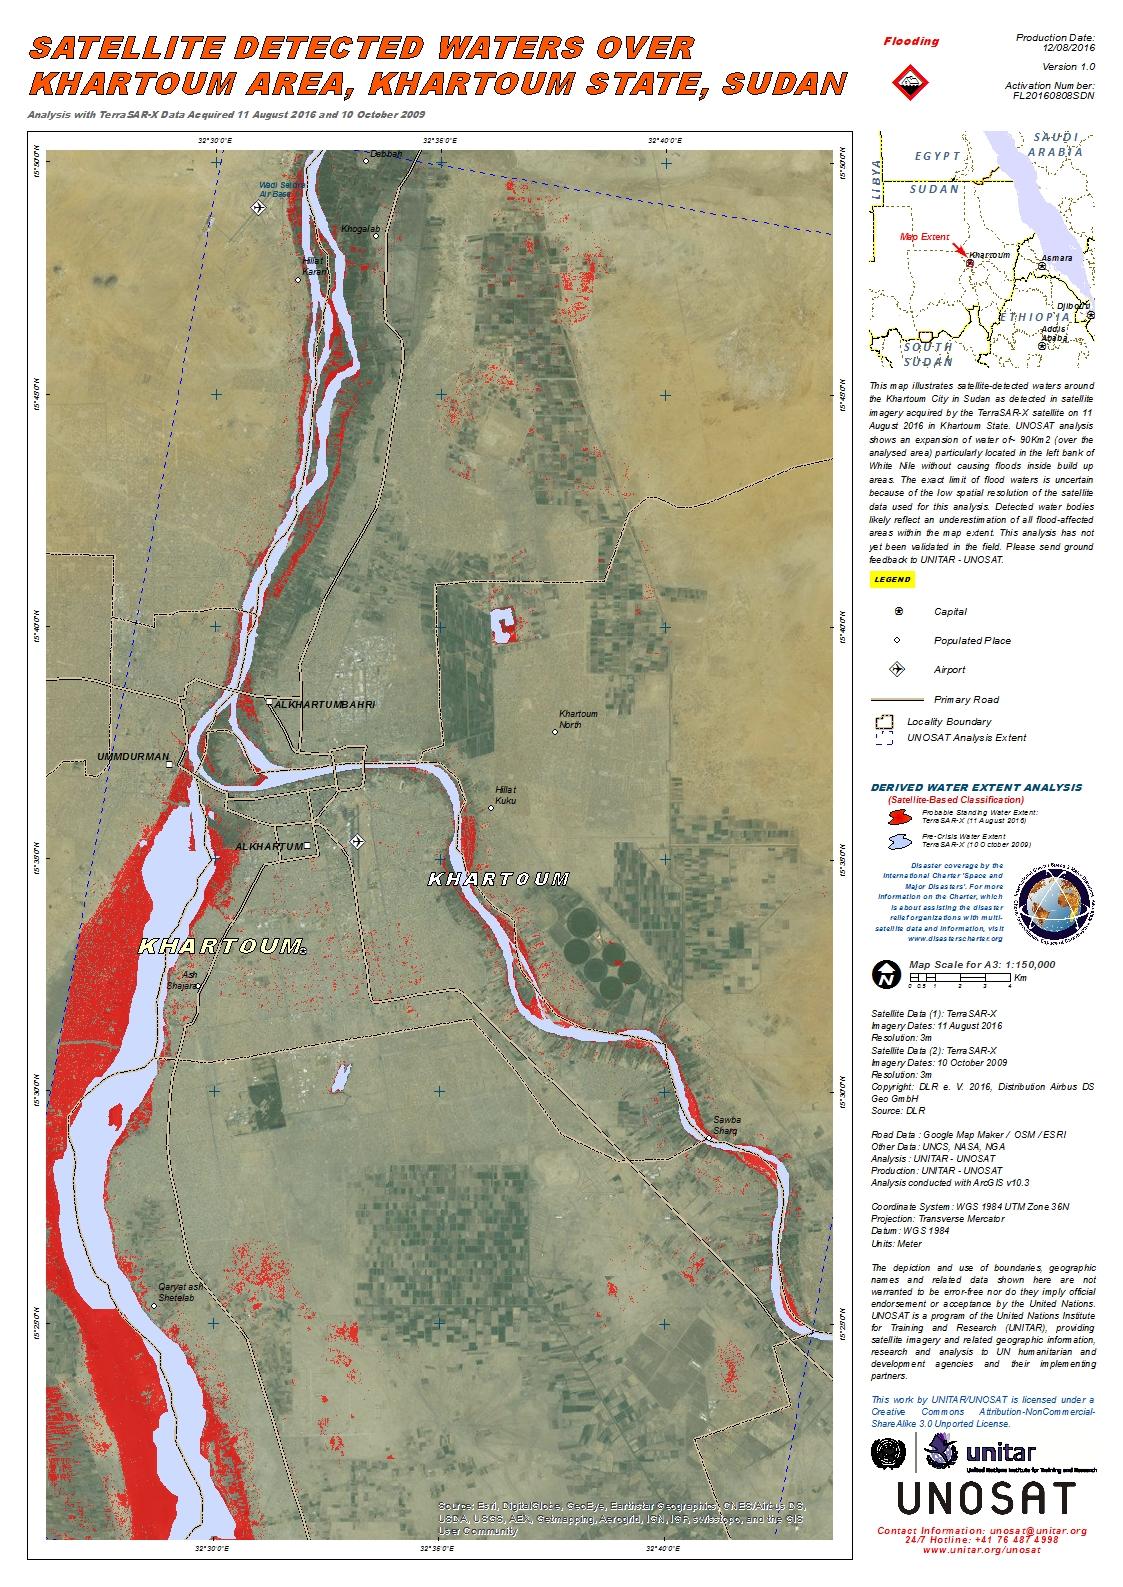 Satellite Detected Waters Over Khartoum Area, Khartoum State, Sudan on damascus map, lake victoria map, casablanca map, tripoli map, kinshasa map, jerusalem map, cairo map, amman map, meroe map, monrovia map, windhoek map, juba map, bujumbura map, addis ababa map, yerevan map, nairobi map, asmara eritrea map, riyadh map, pretoria map, brazzaville map,